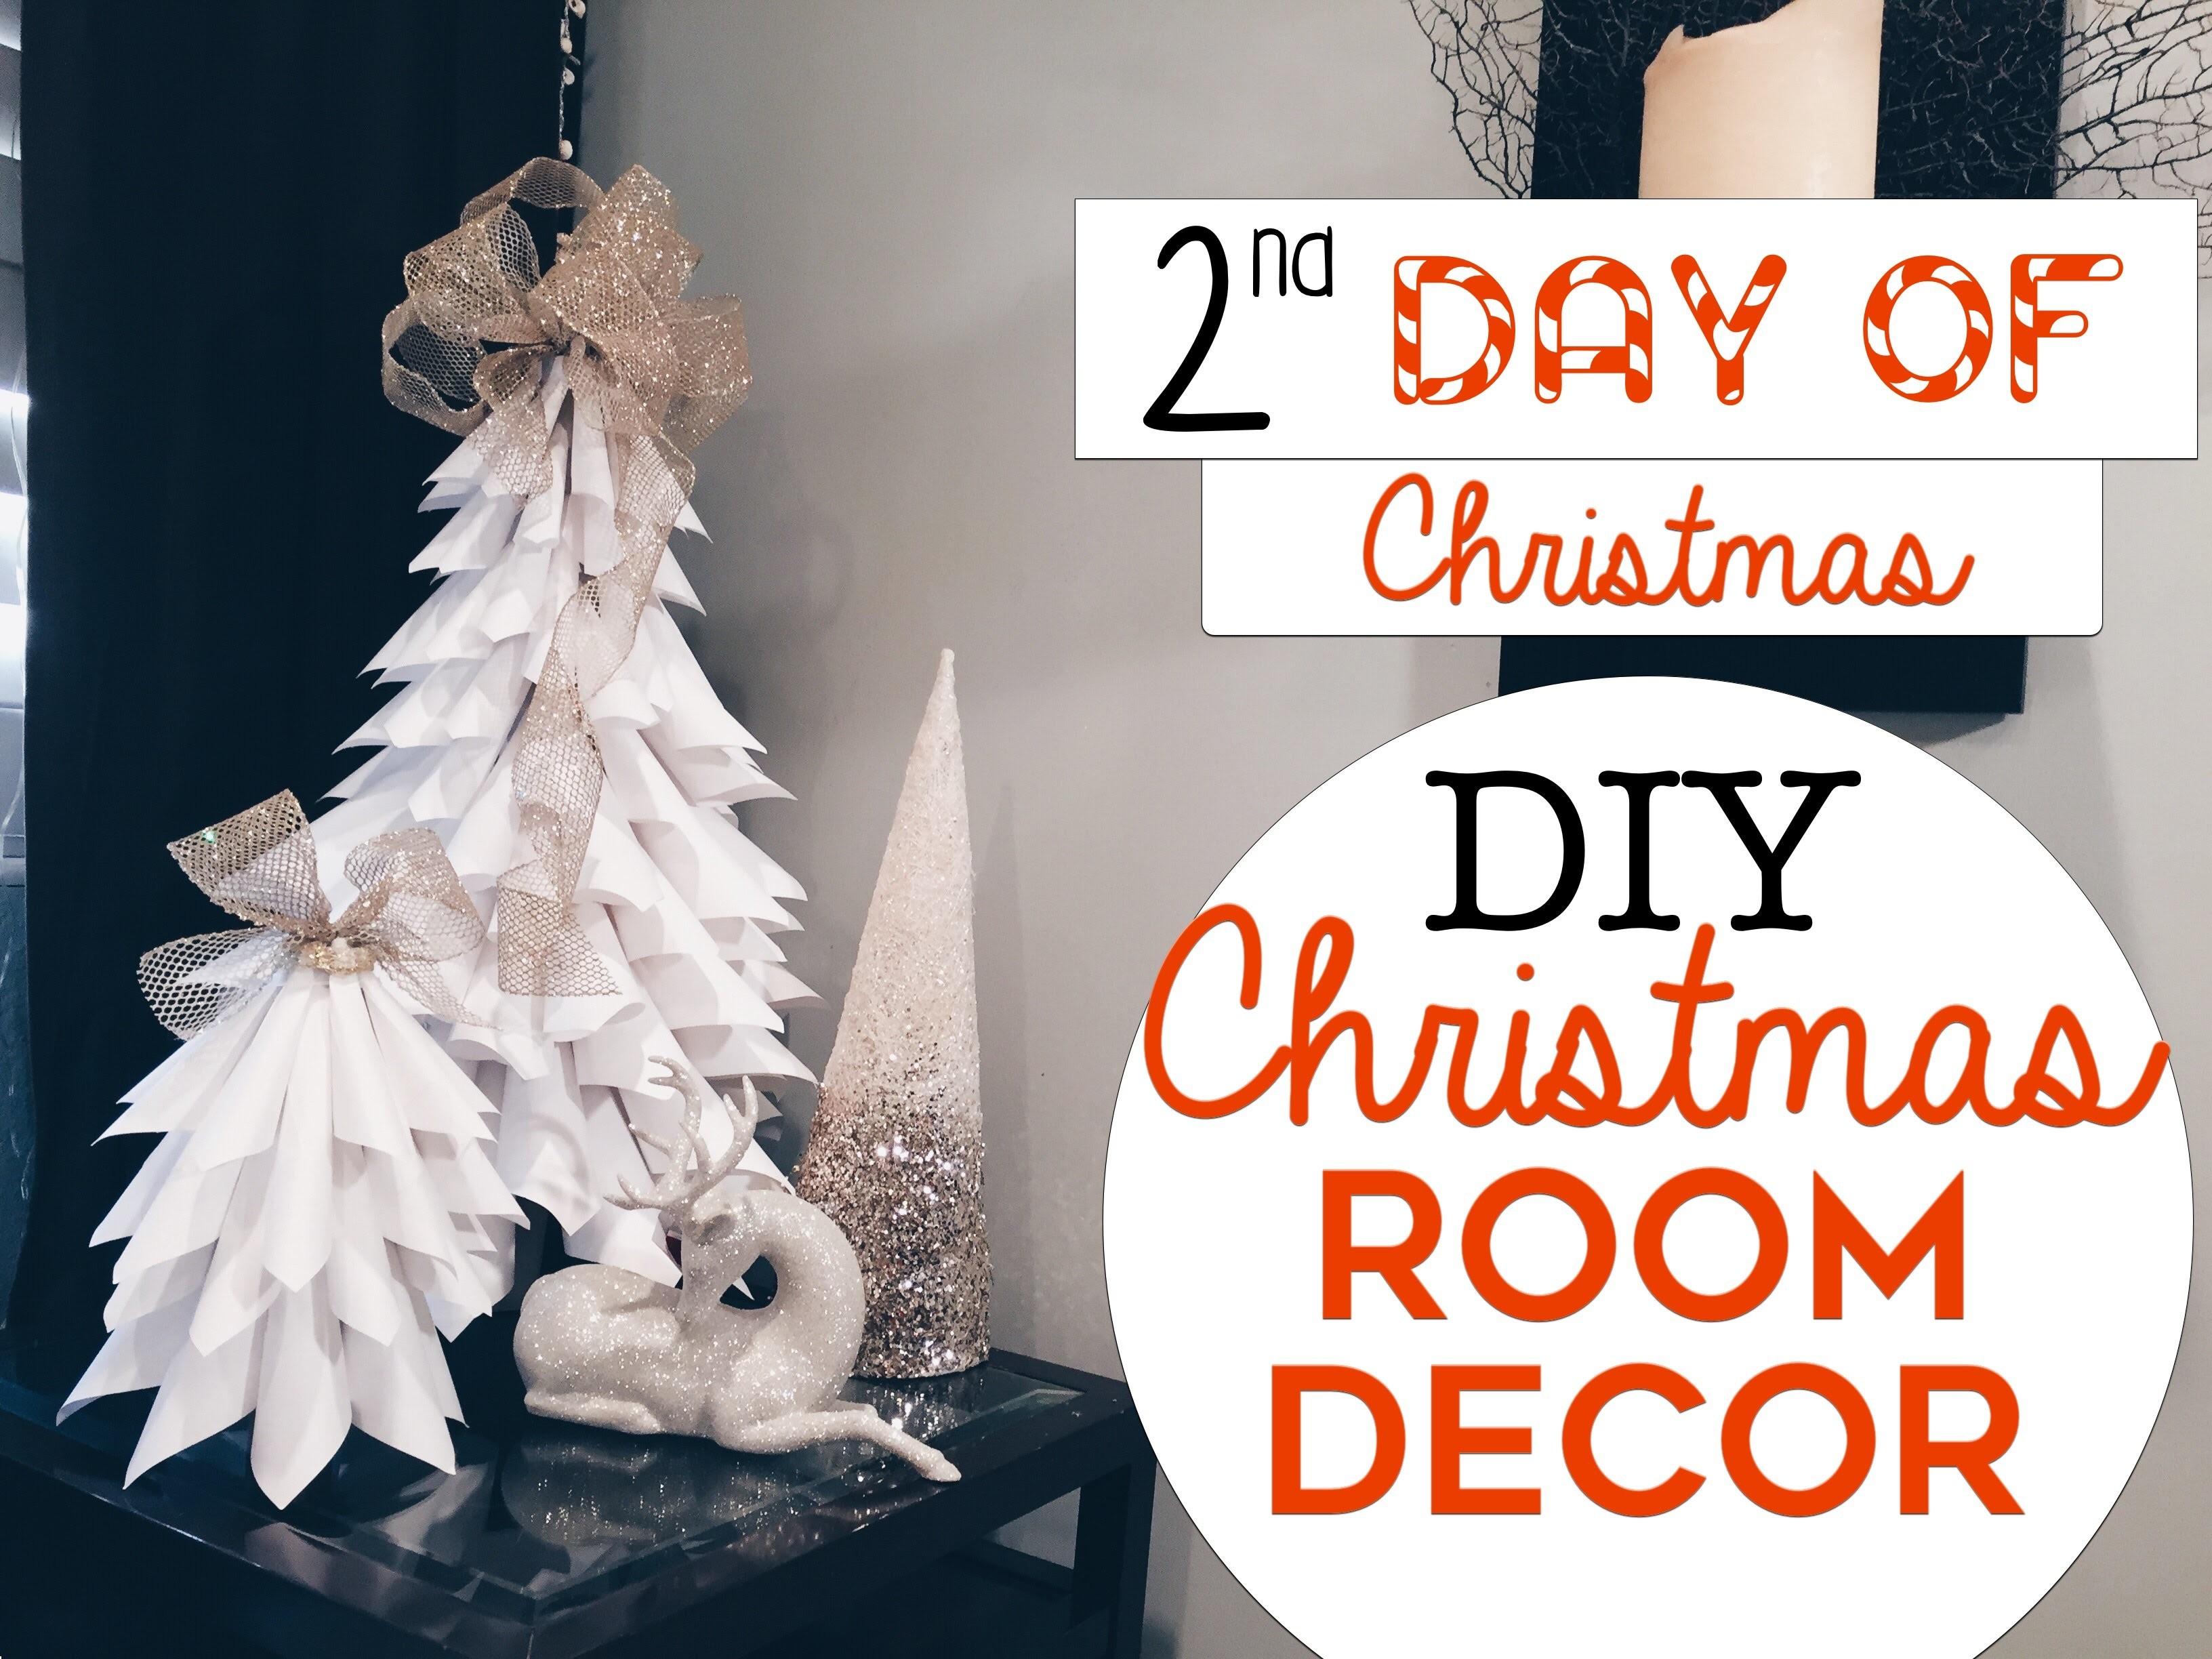 3 EASY Christmas Room Decor DIY's   2nd Day of Christmas!   DIY Christmas Trees for Small Spaces